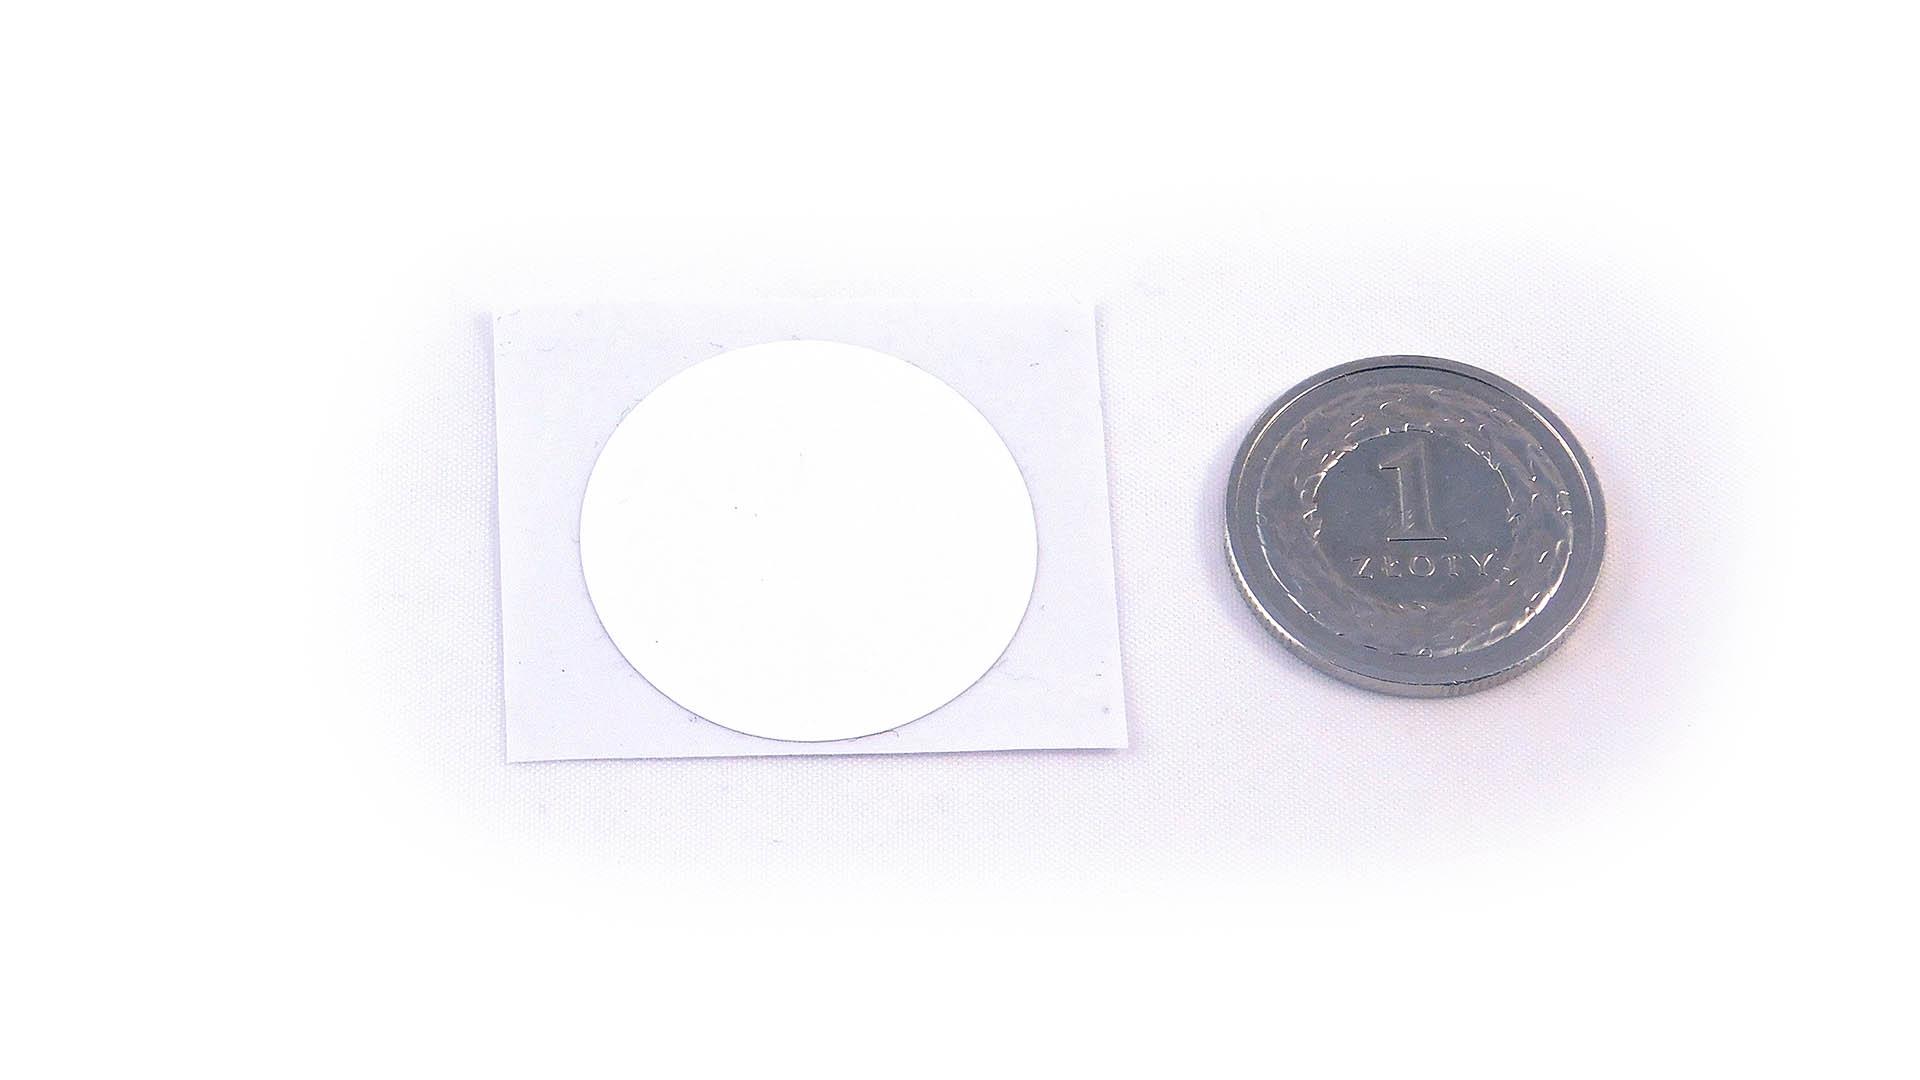 Nettigo: RFID/NFC waterproof sticker - NTAG203